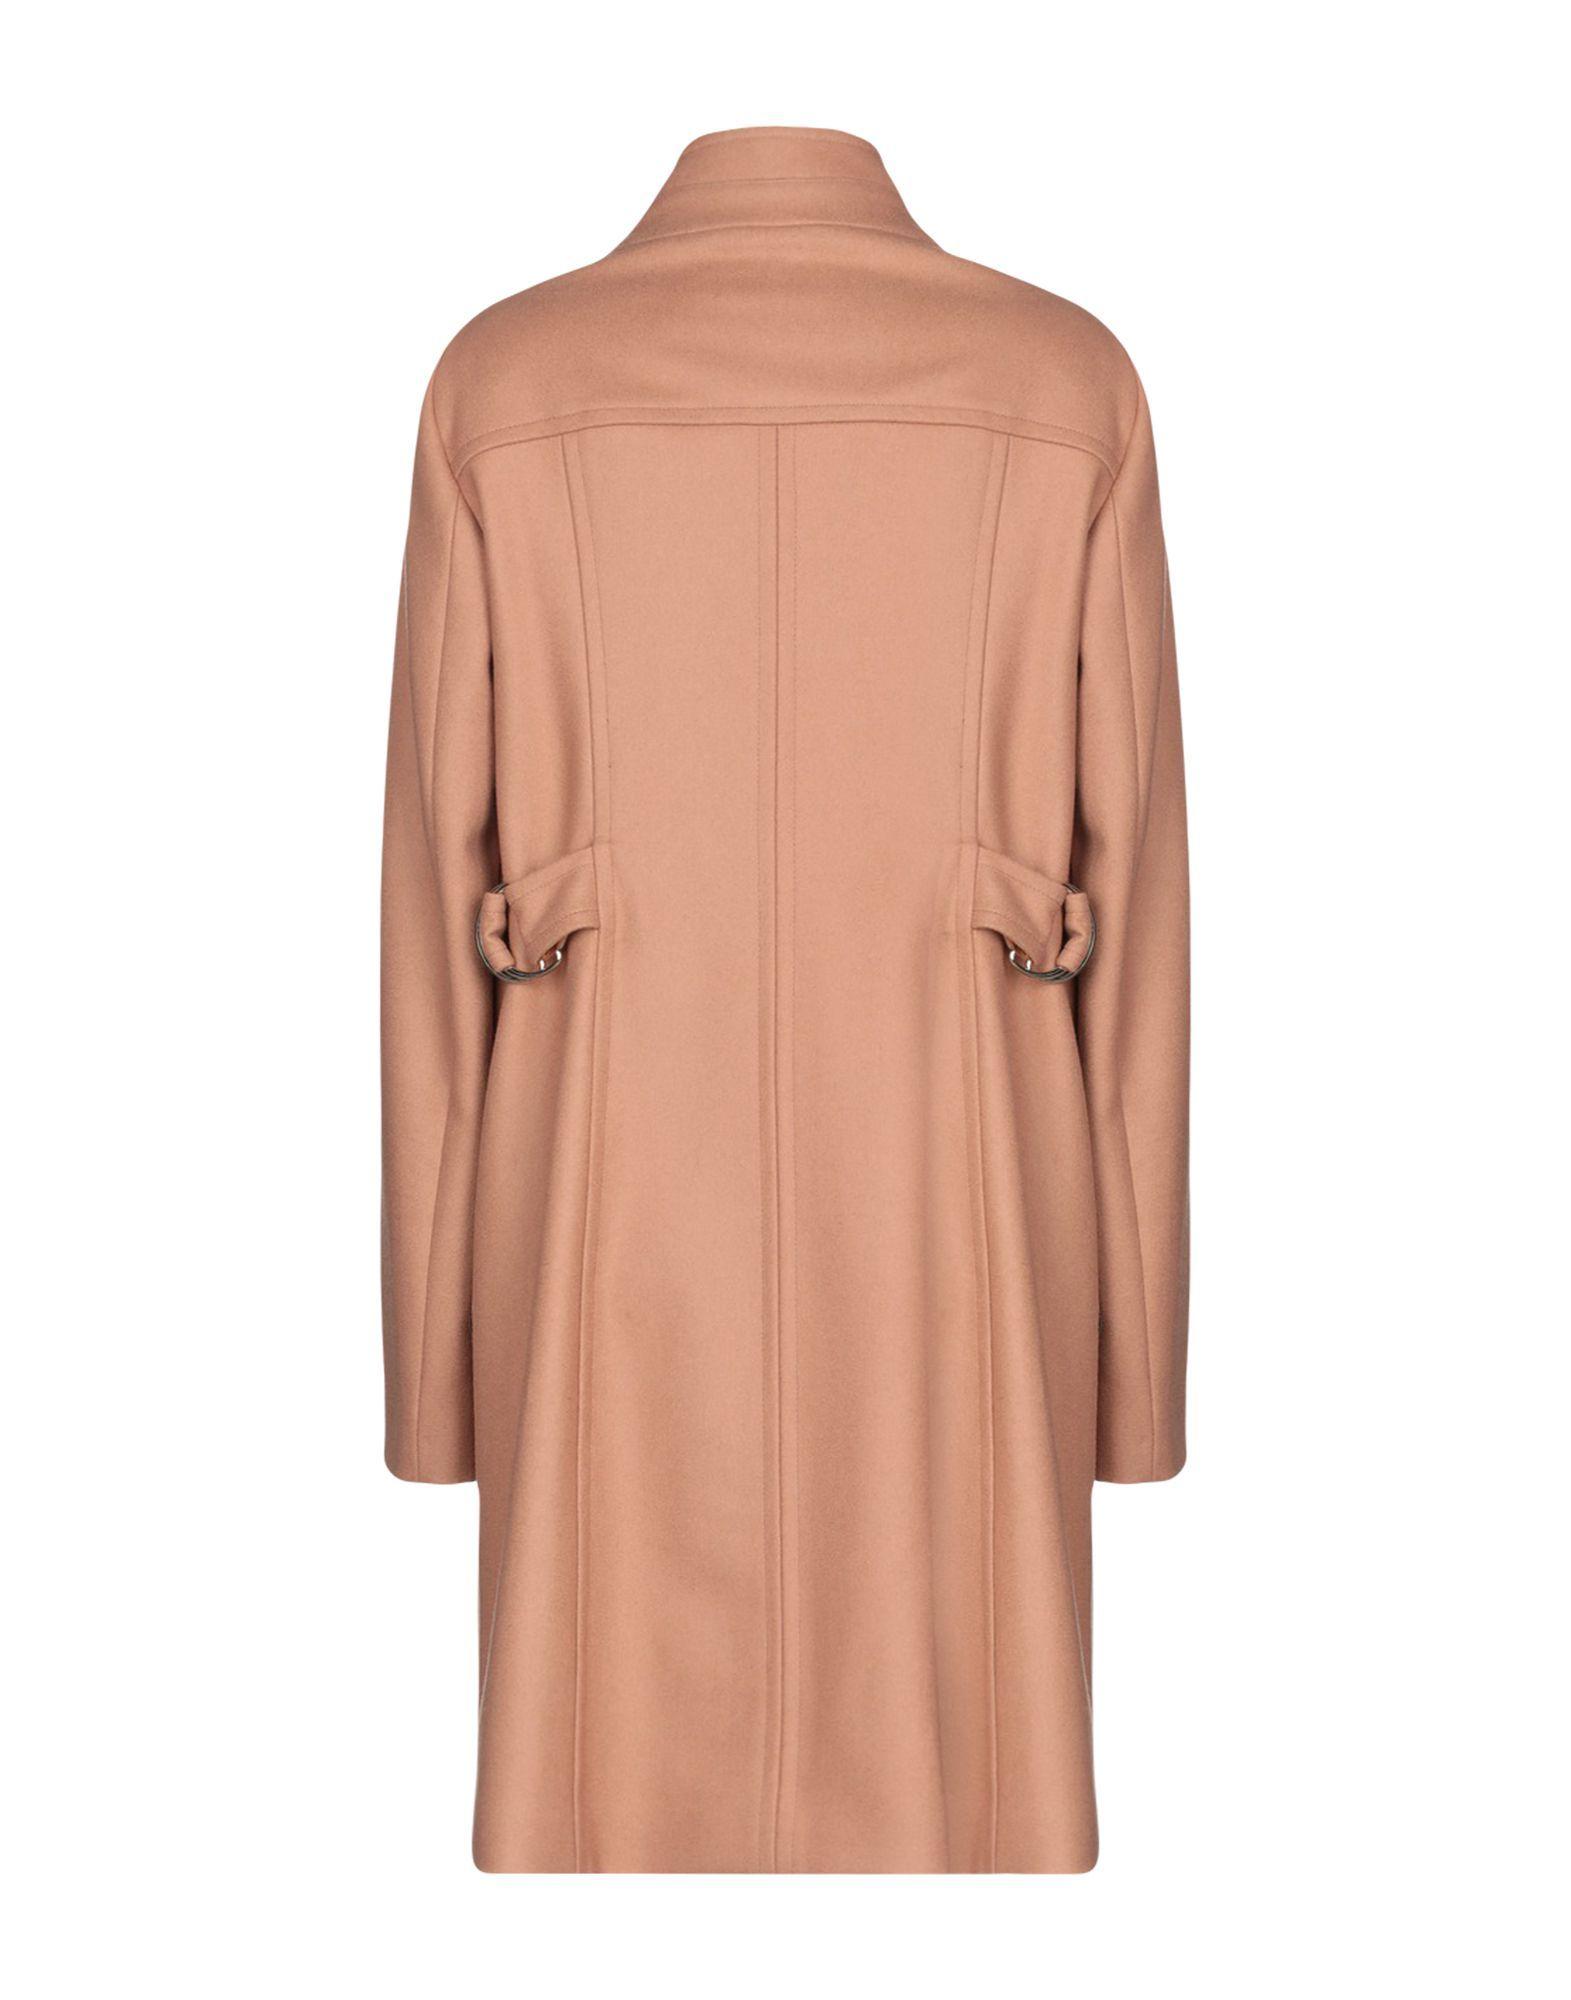 COATS & JACKETS Annie P. Camel Woman Virgin Wool